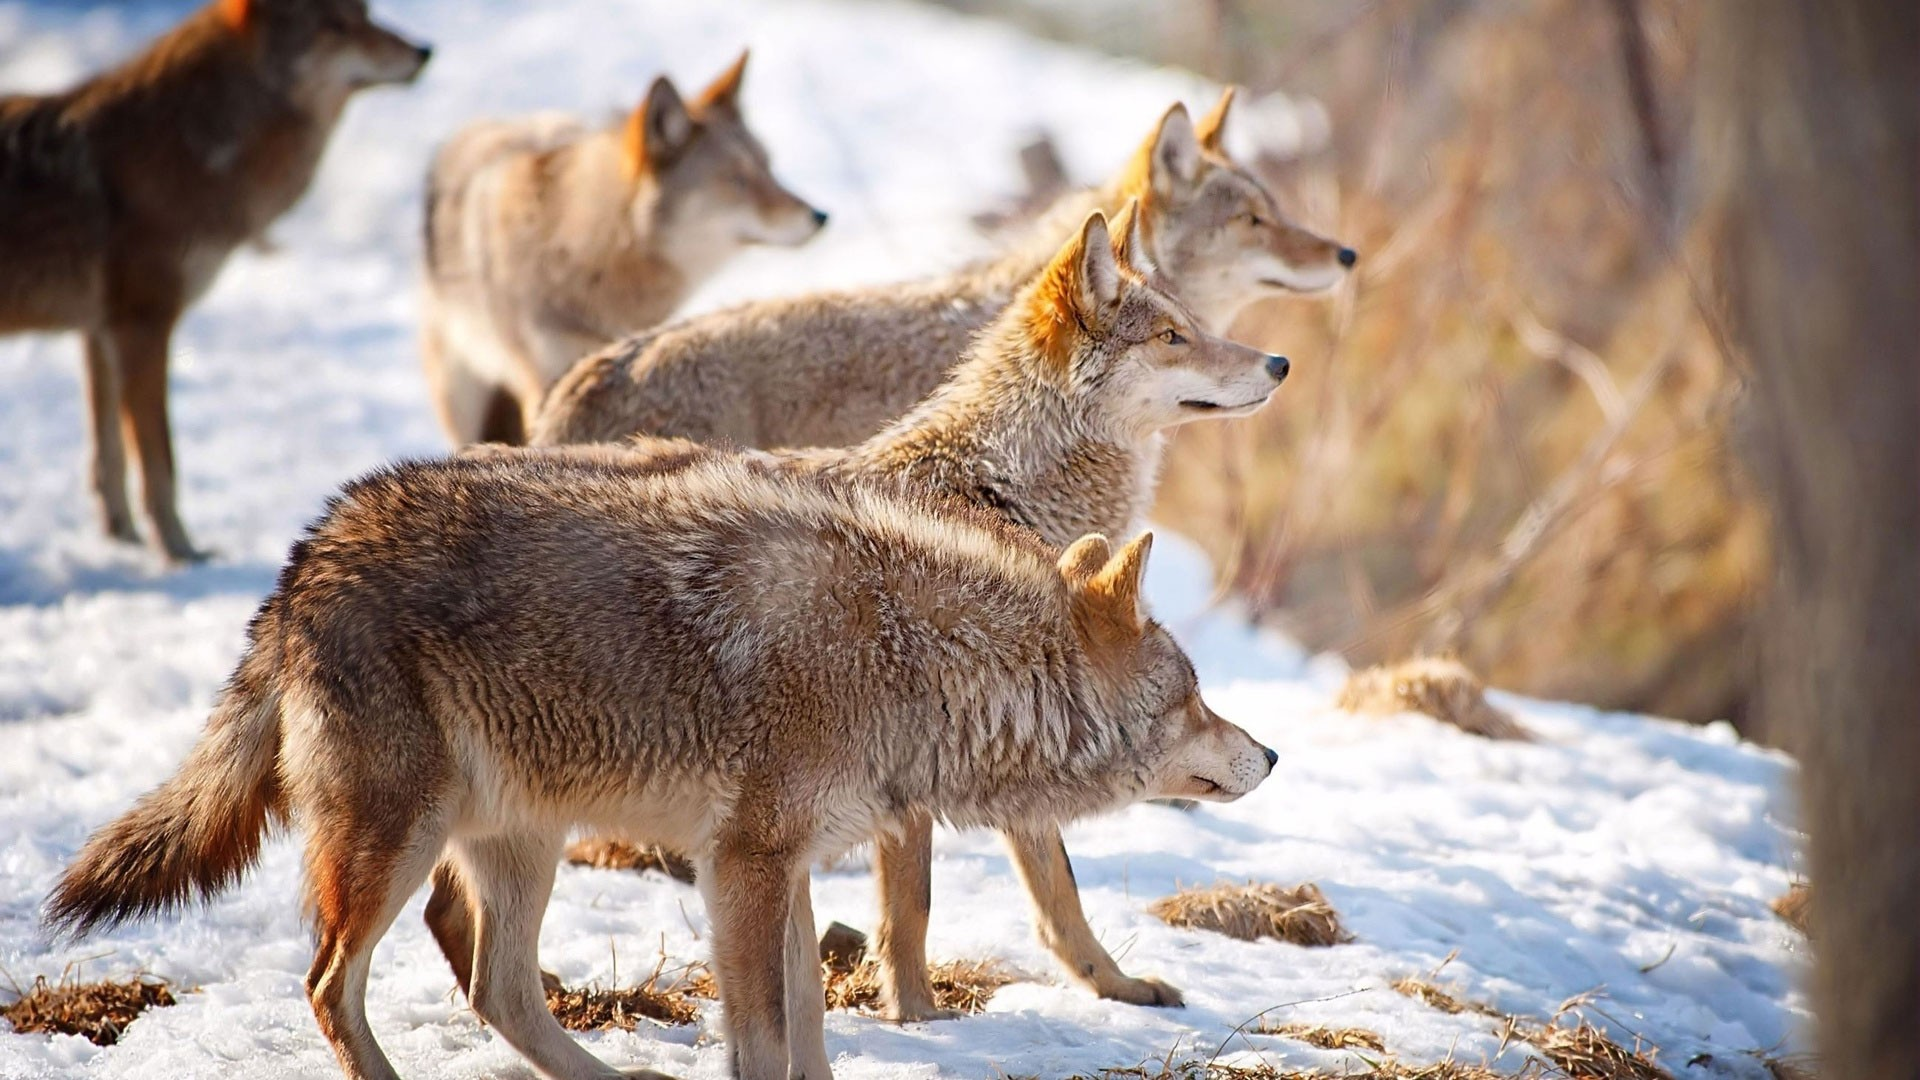 … Background Full HD 1080p. Wallpaper wolves, snow, flock,  winter, hunting